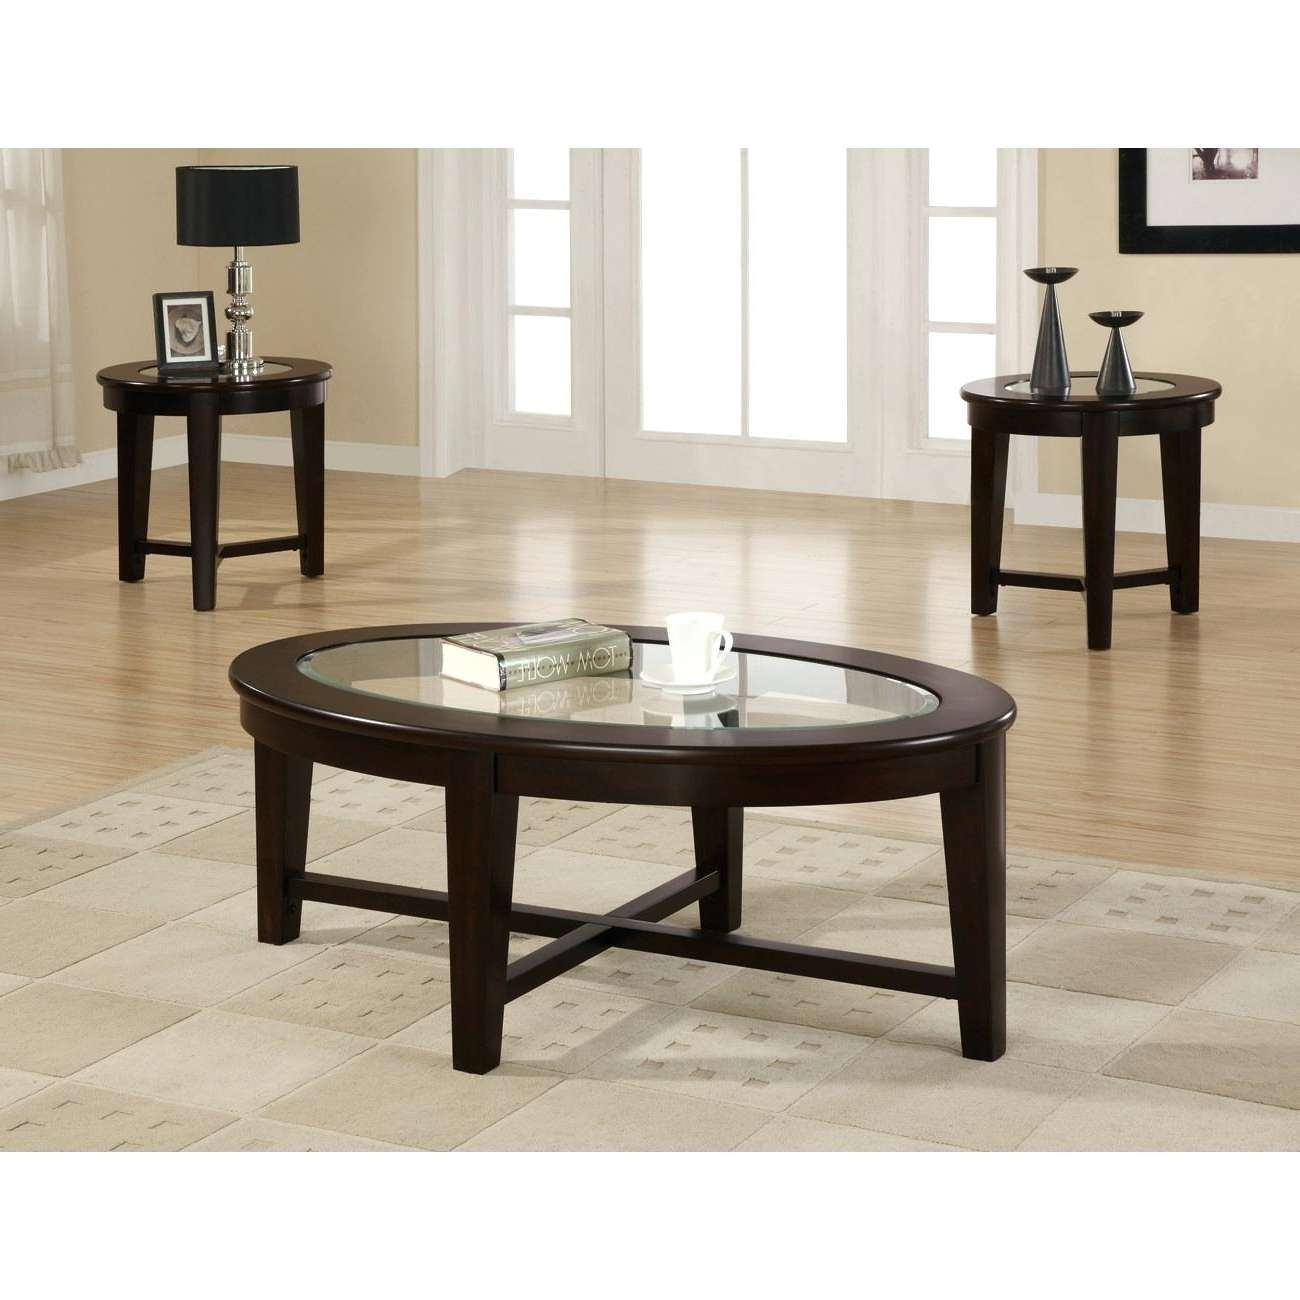 Newest Wayfair Glass Coffee Tables With Wayfair Coffee Table Sets – Akiyo (View 15 of 20)